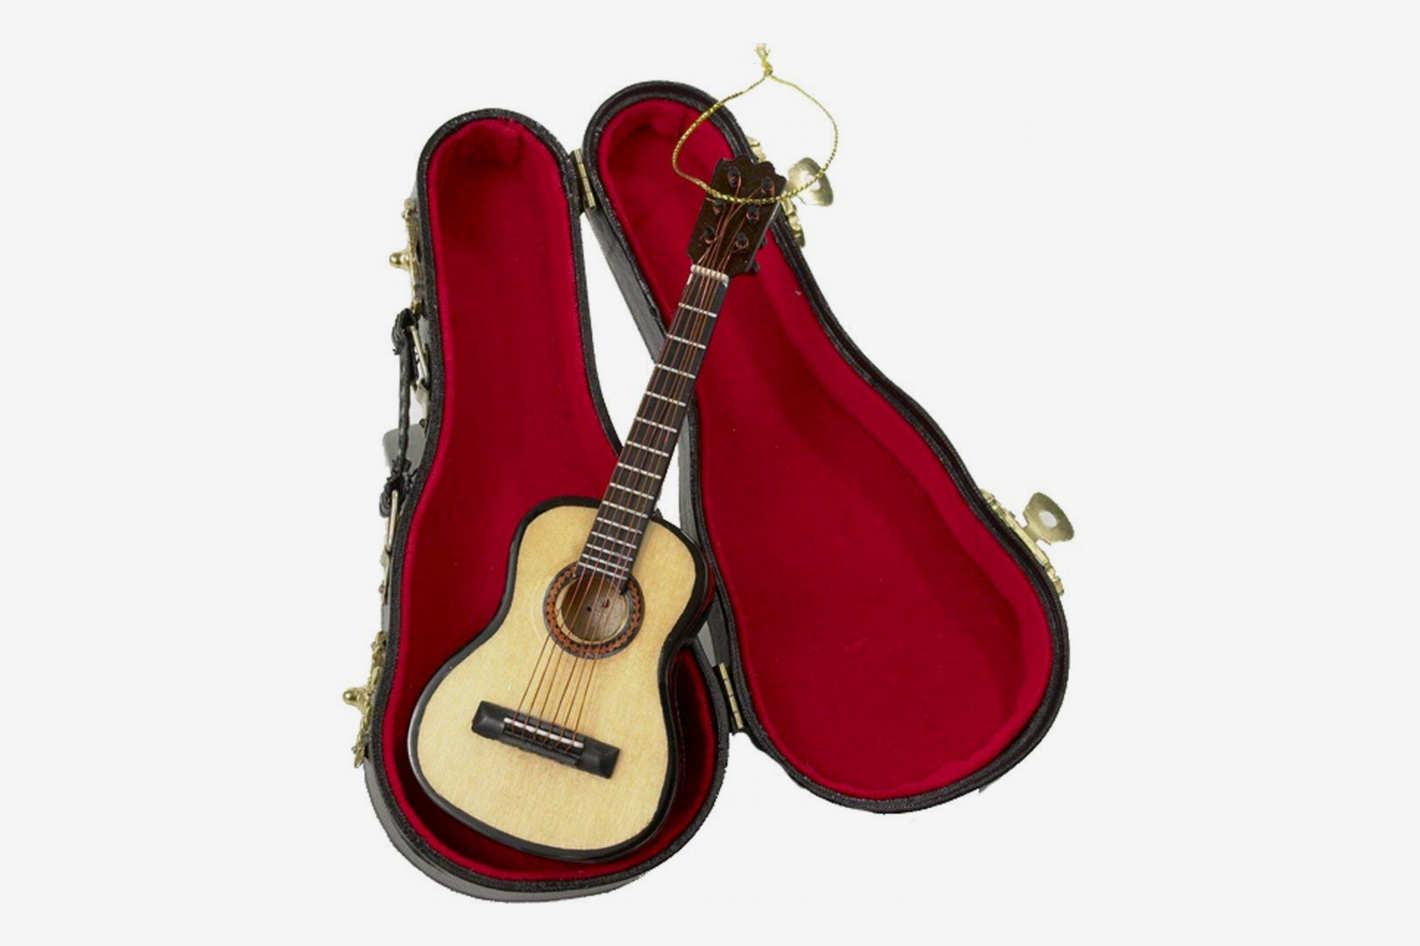 Kurt Adler 5.52-InchWood Pearlized Guitar Ornament